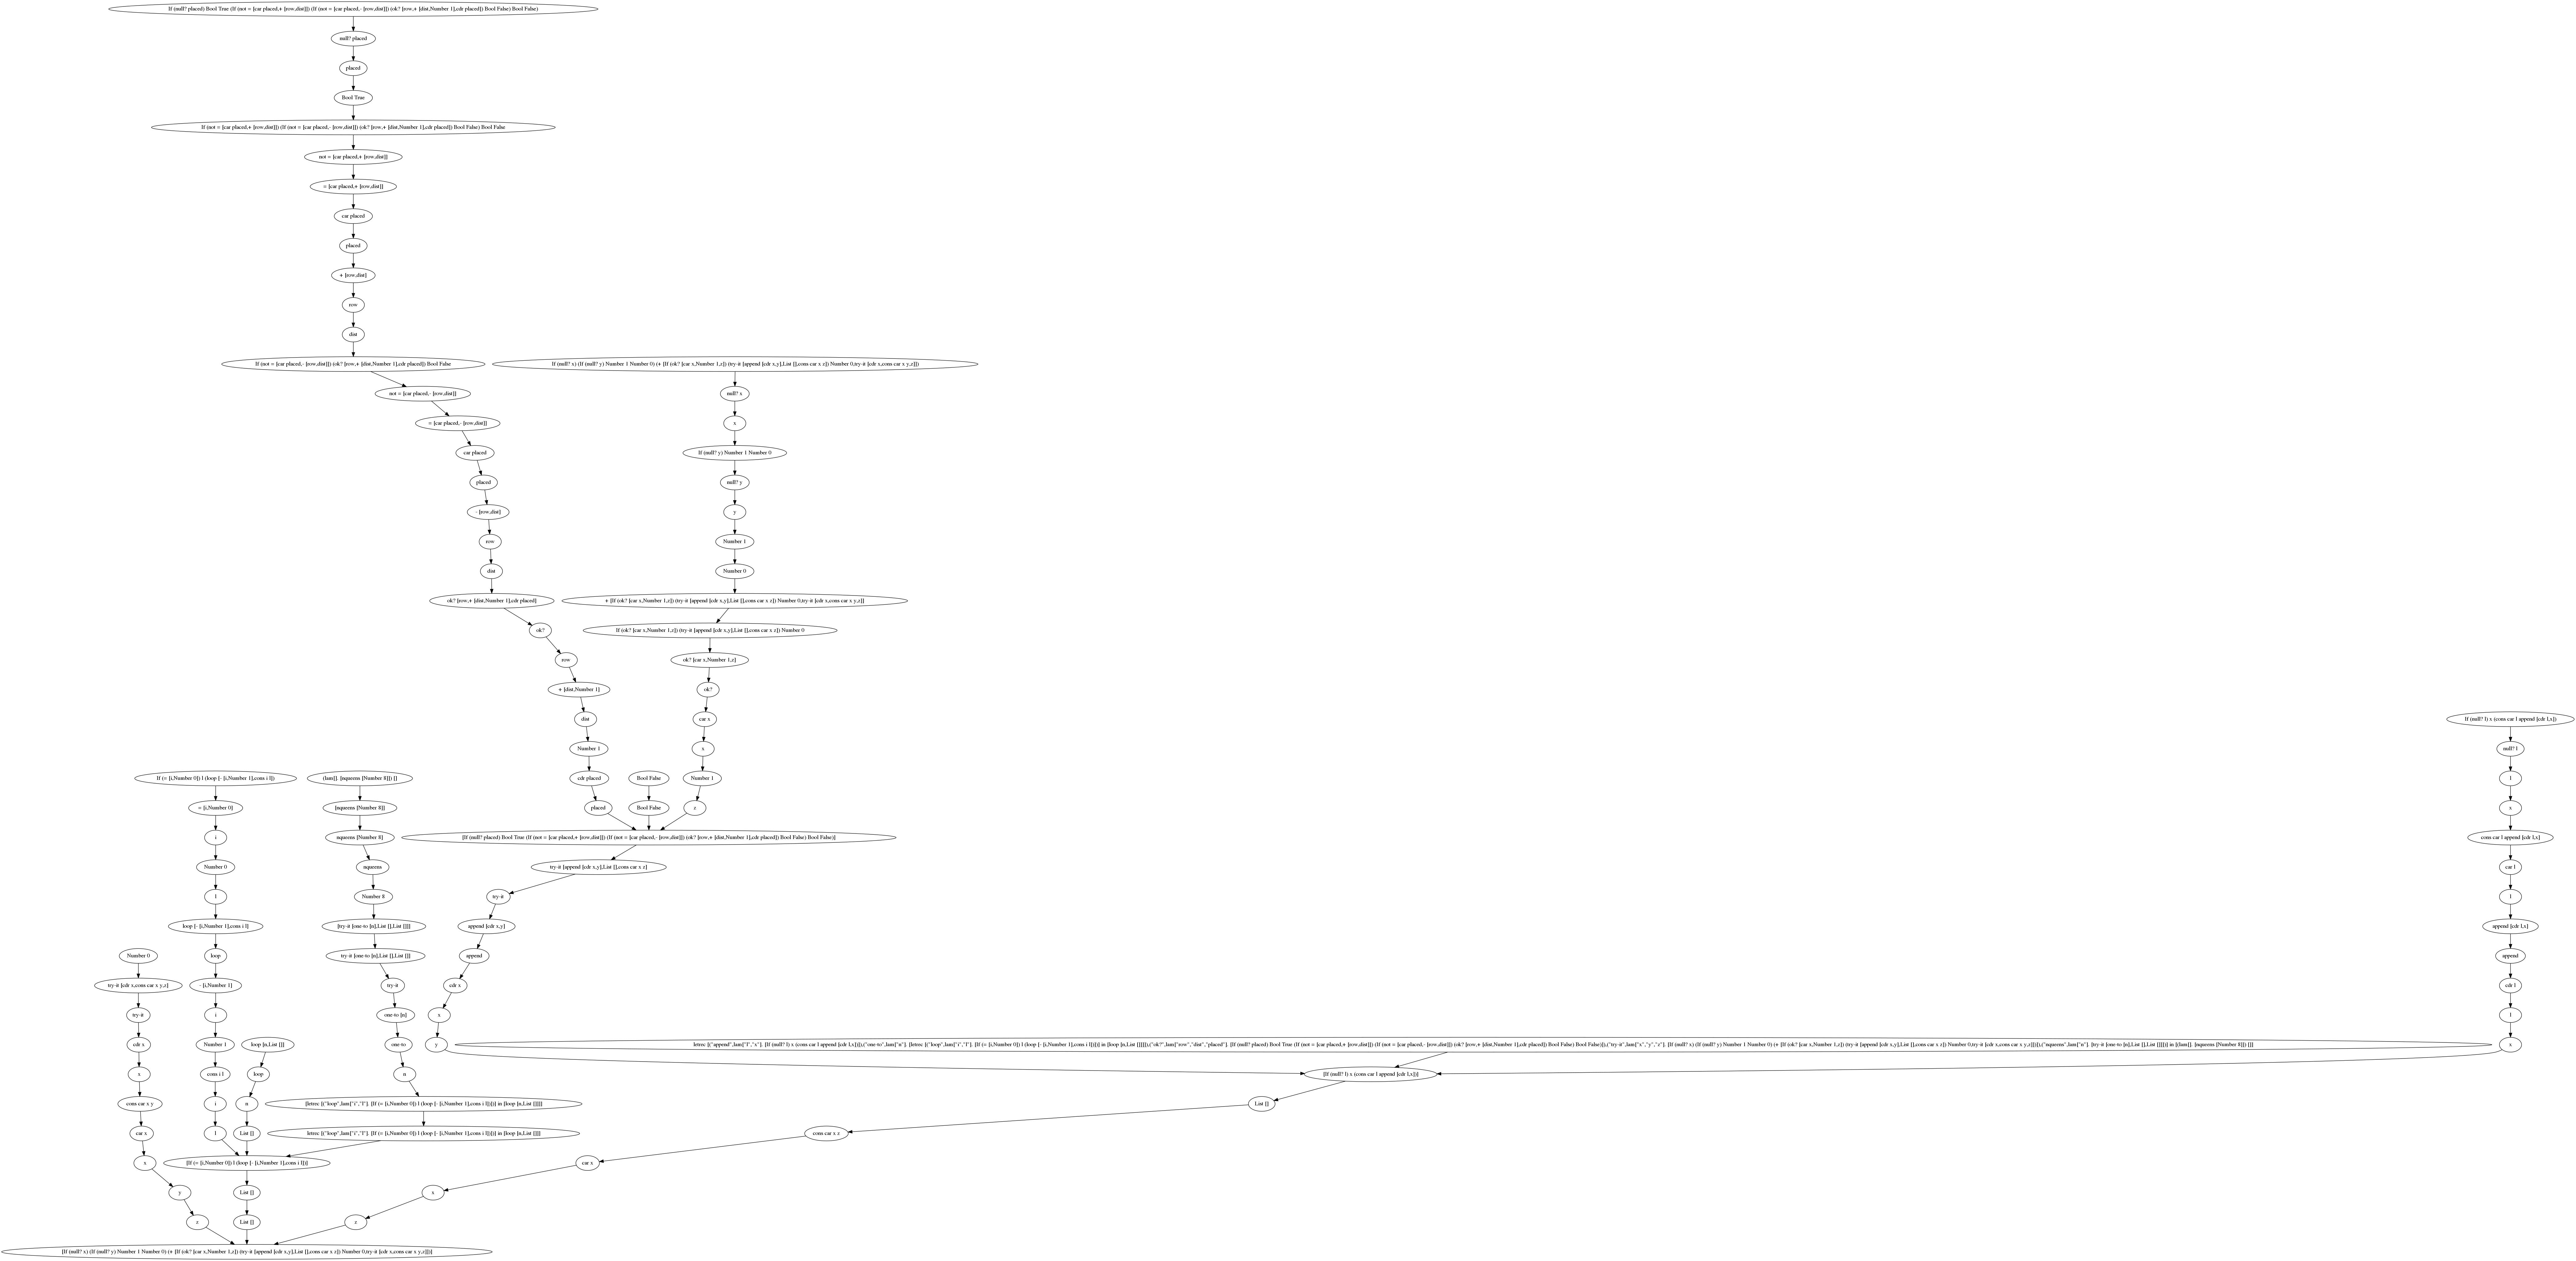 scheme/graph_files/scala-am/nqueens.png